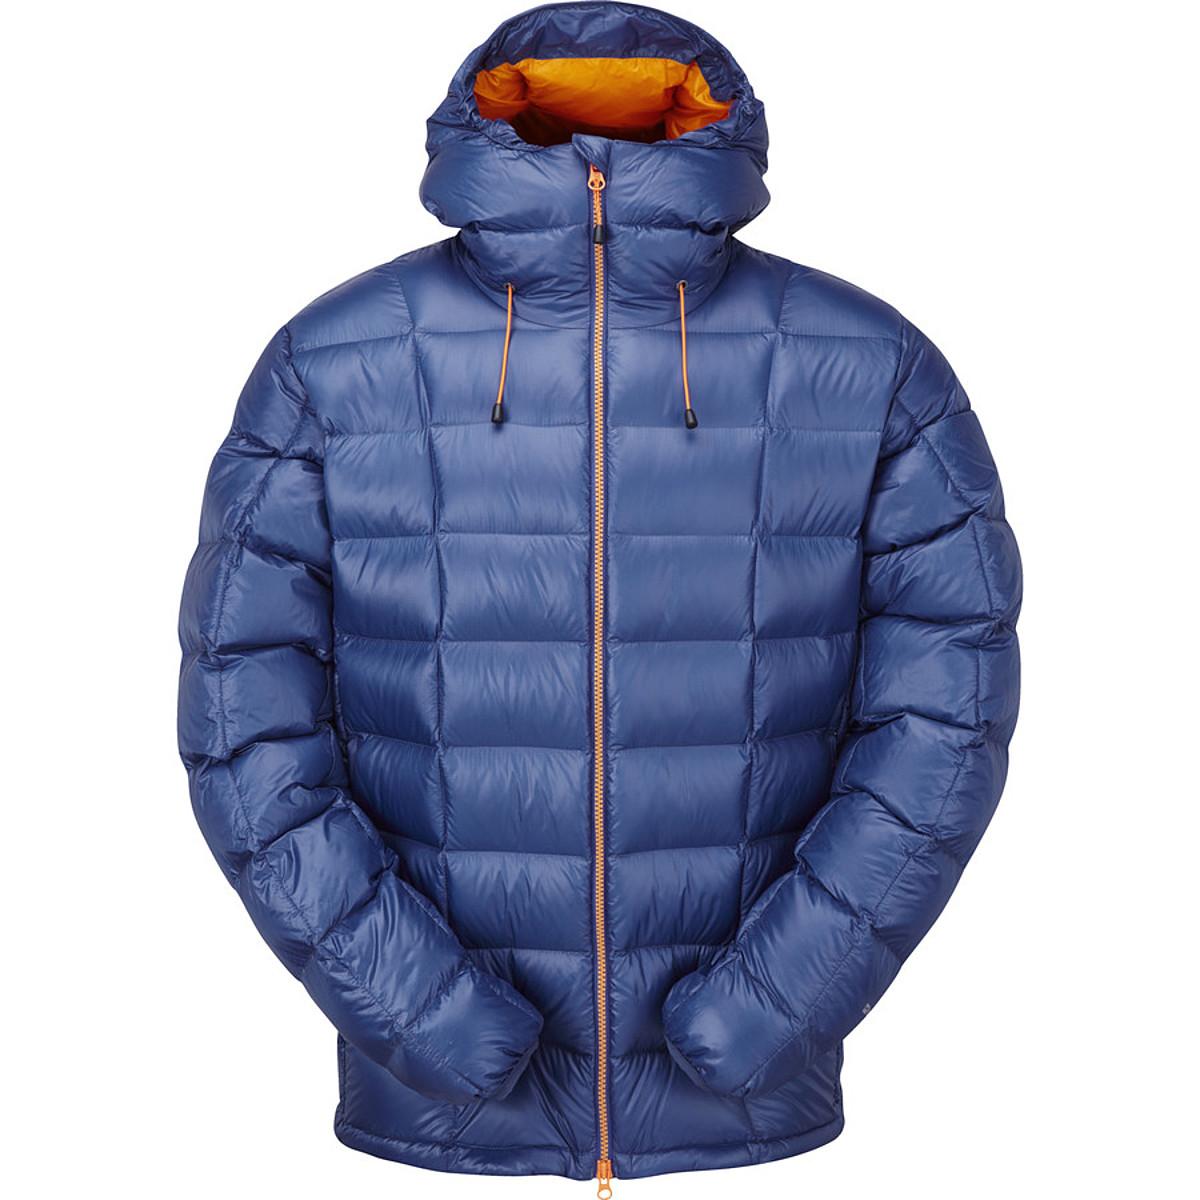 Mountain Equipment Lumin Jacket